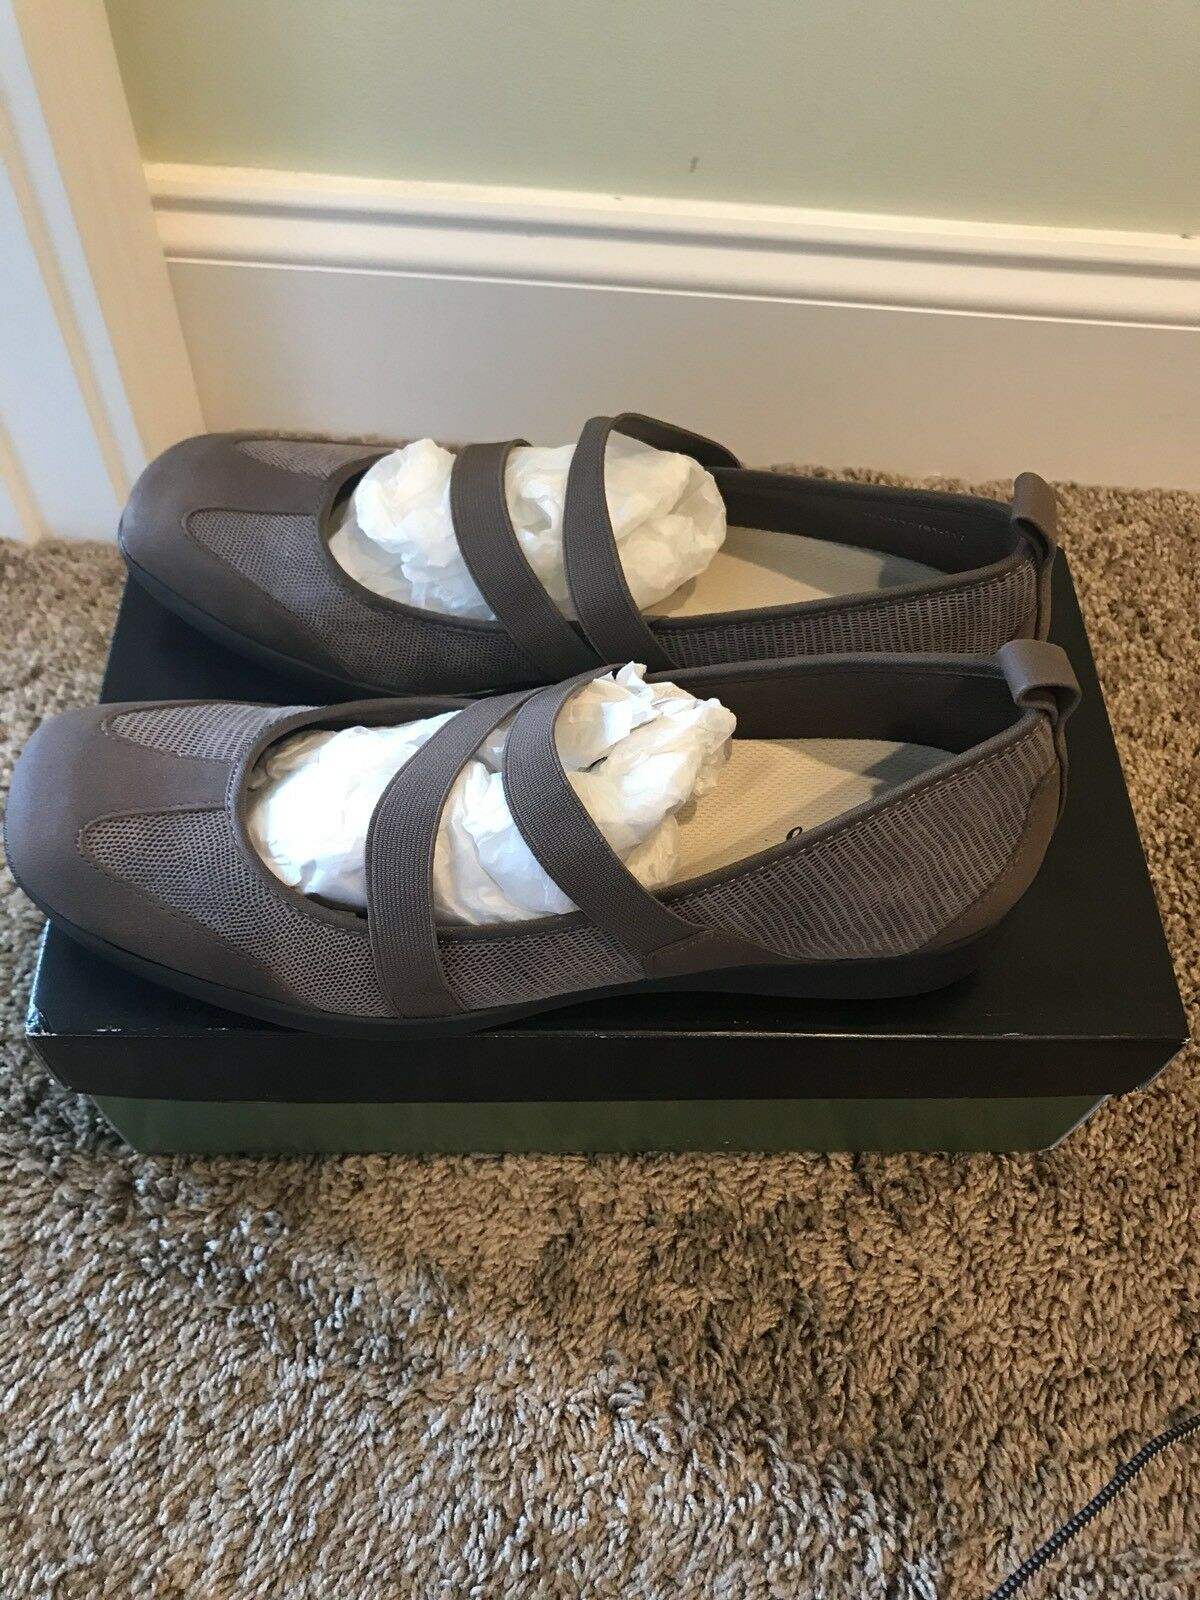 online al miglior prezzo NWB donna Trotters Josie Taupe Lizard Lizard Lizard Mary Janes scarpe 10.5 Marrone New  l'ultimo